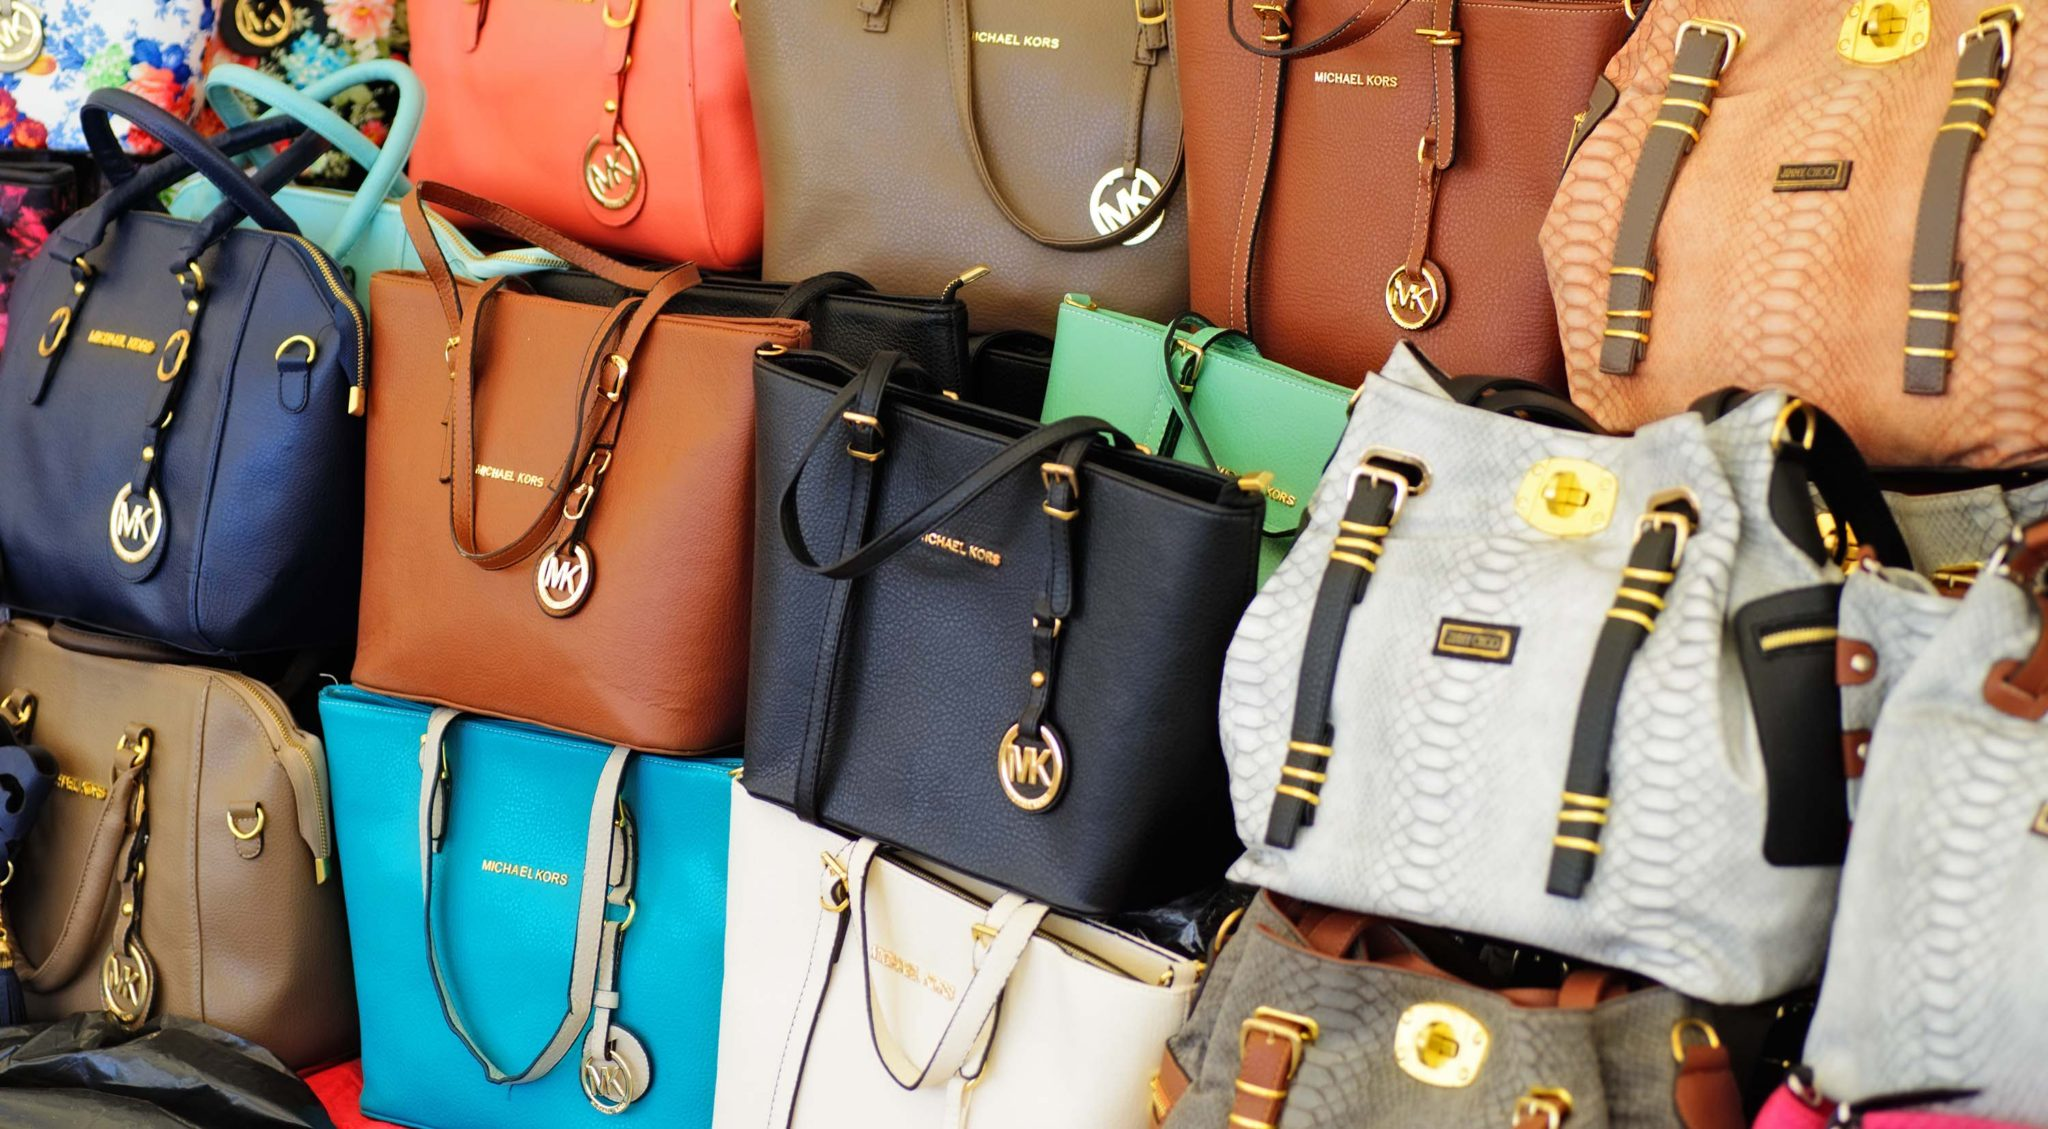 counterfeit high-end handbags